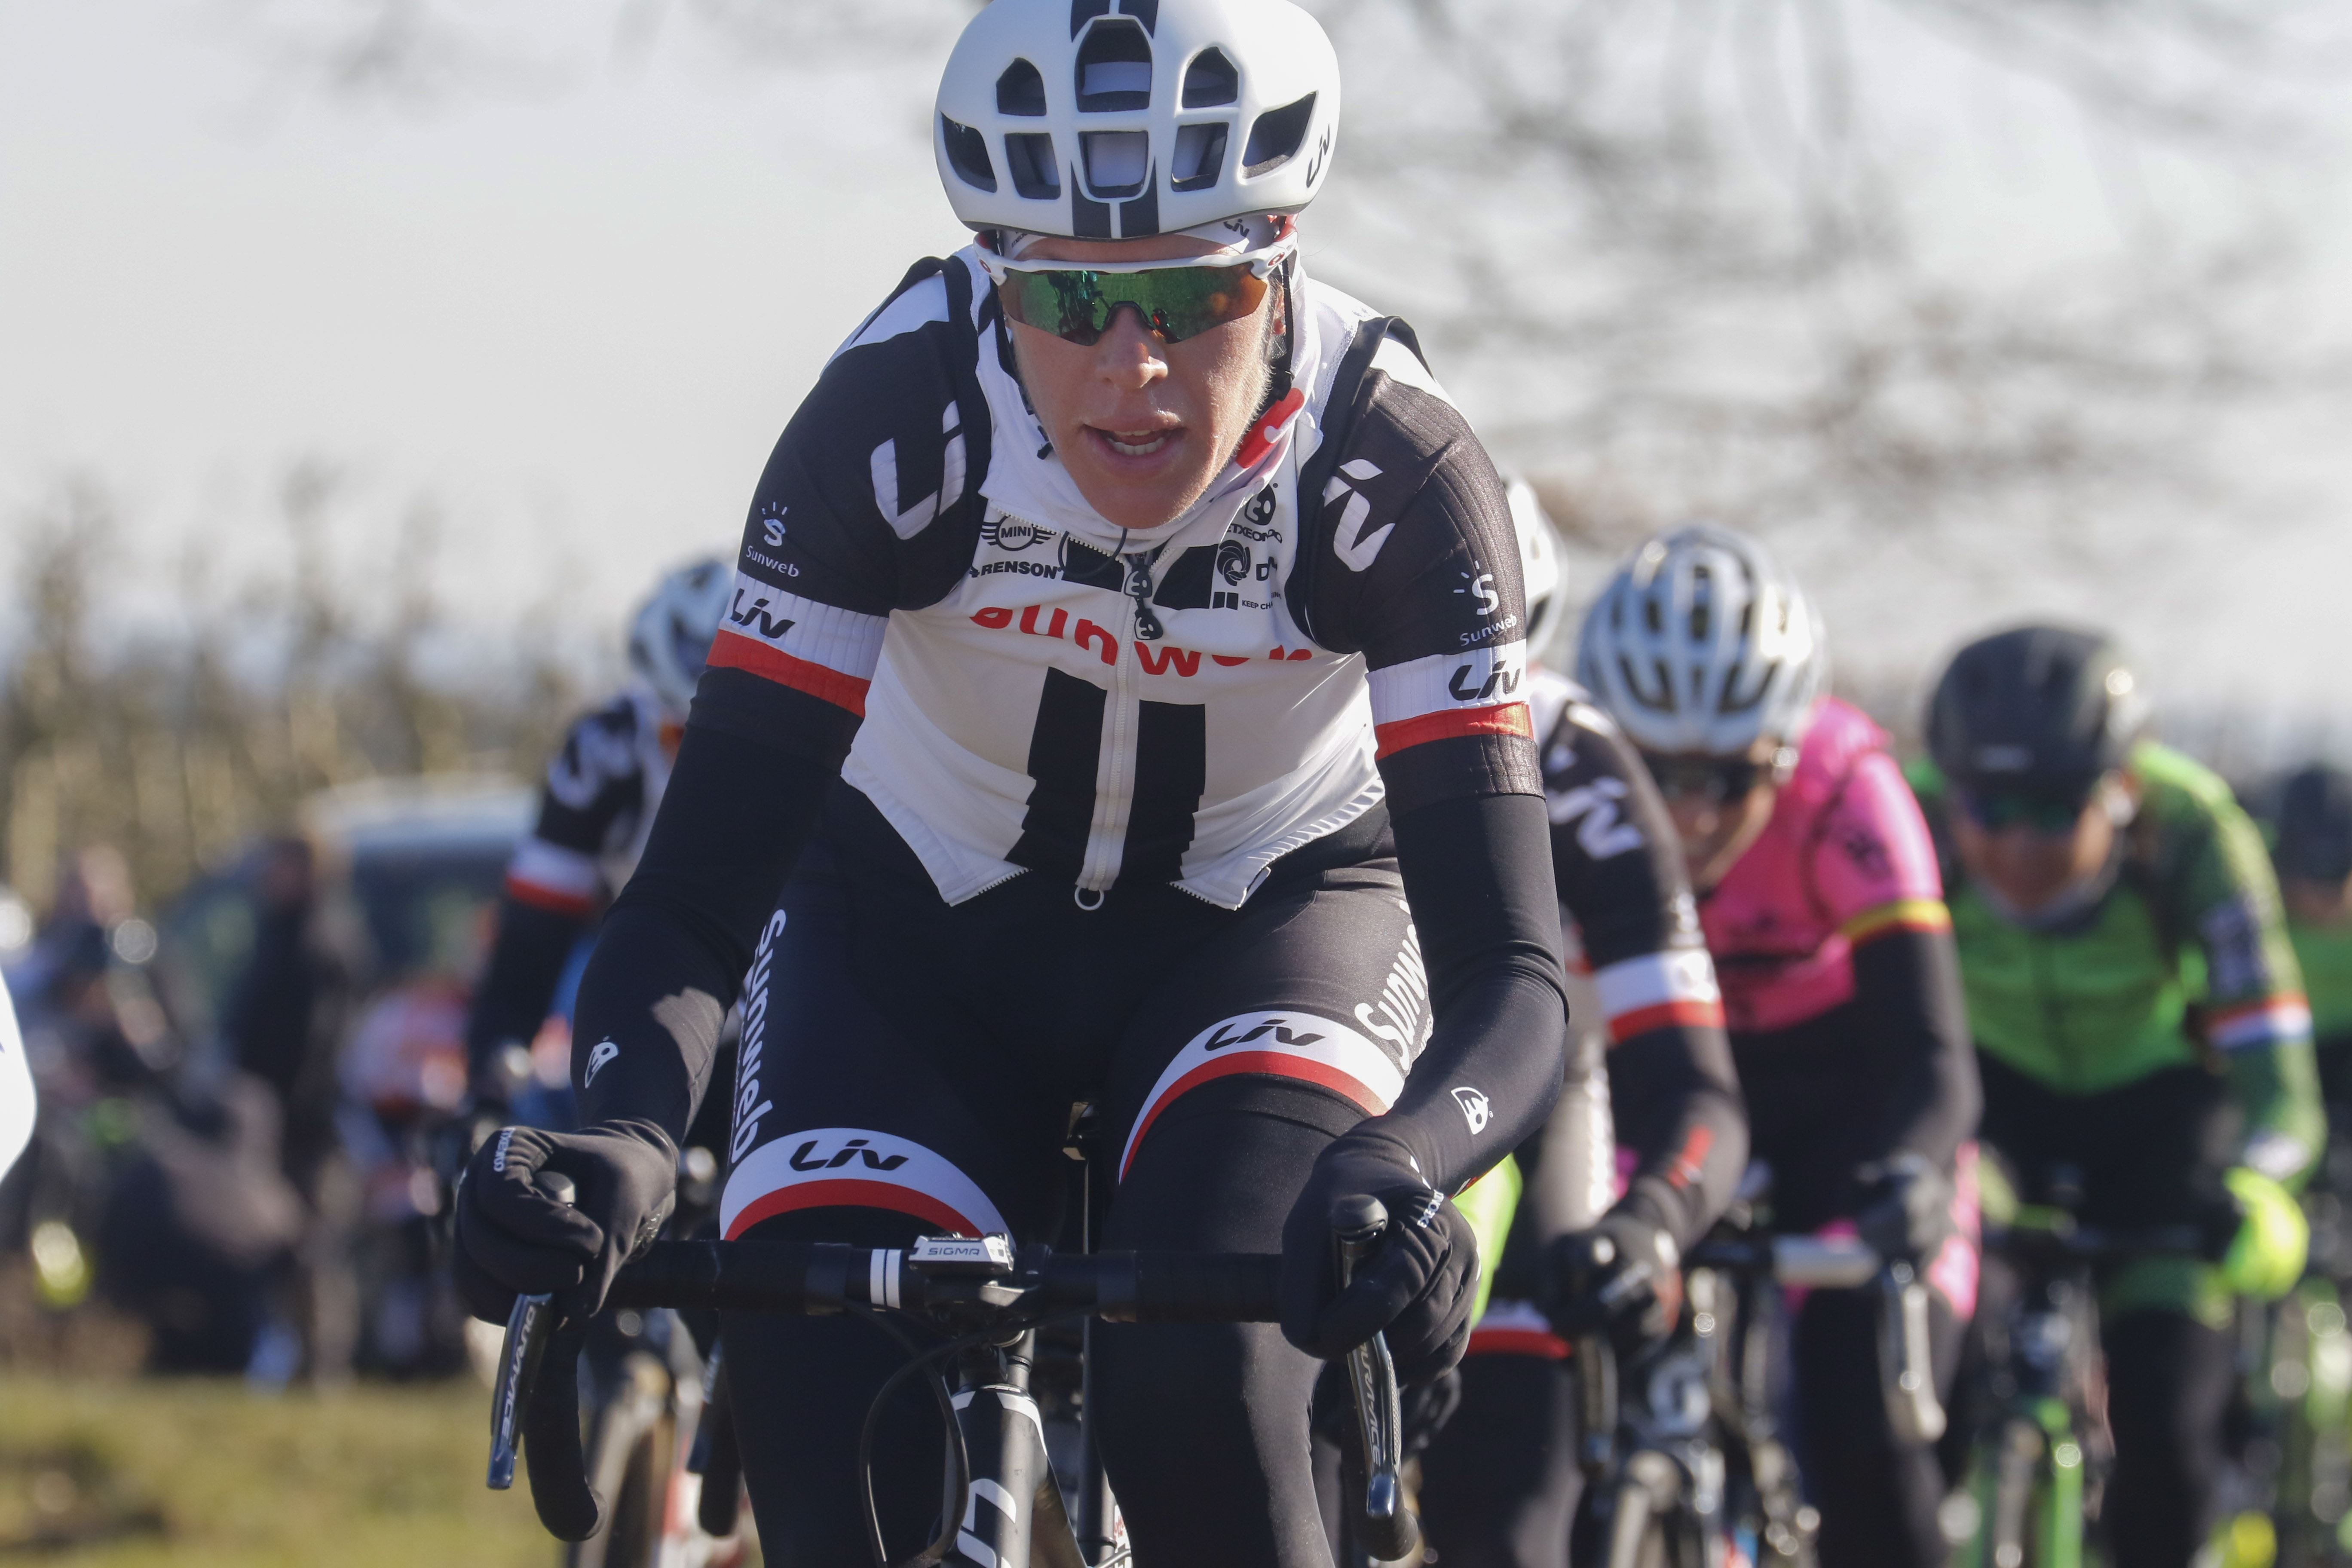 Watch Ellen van Dijk world road and track cycling champion video